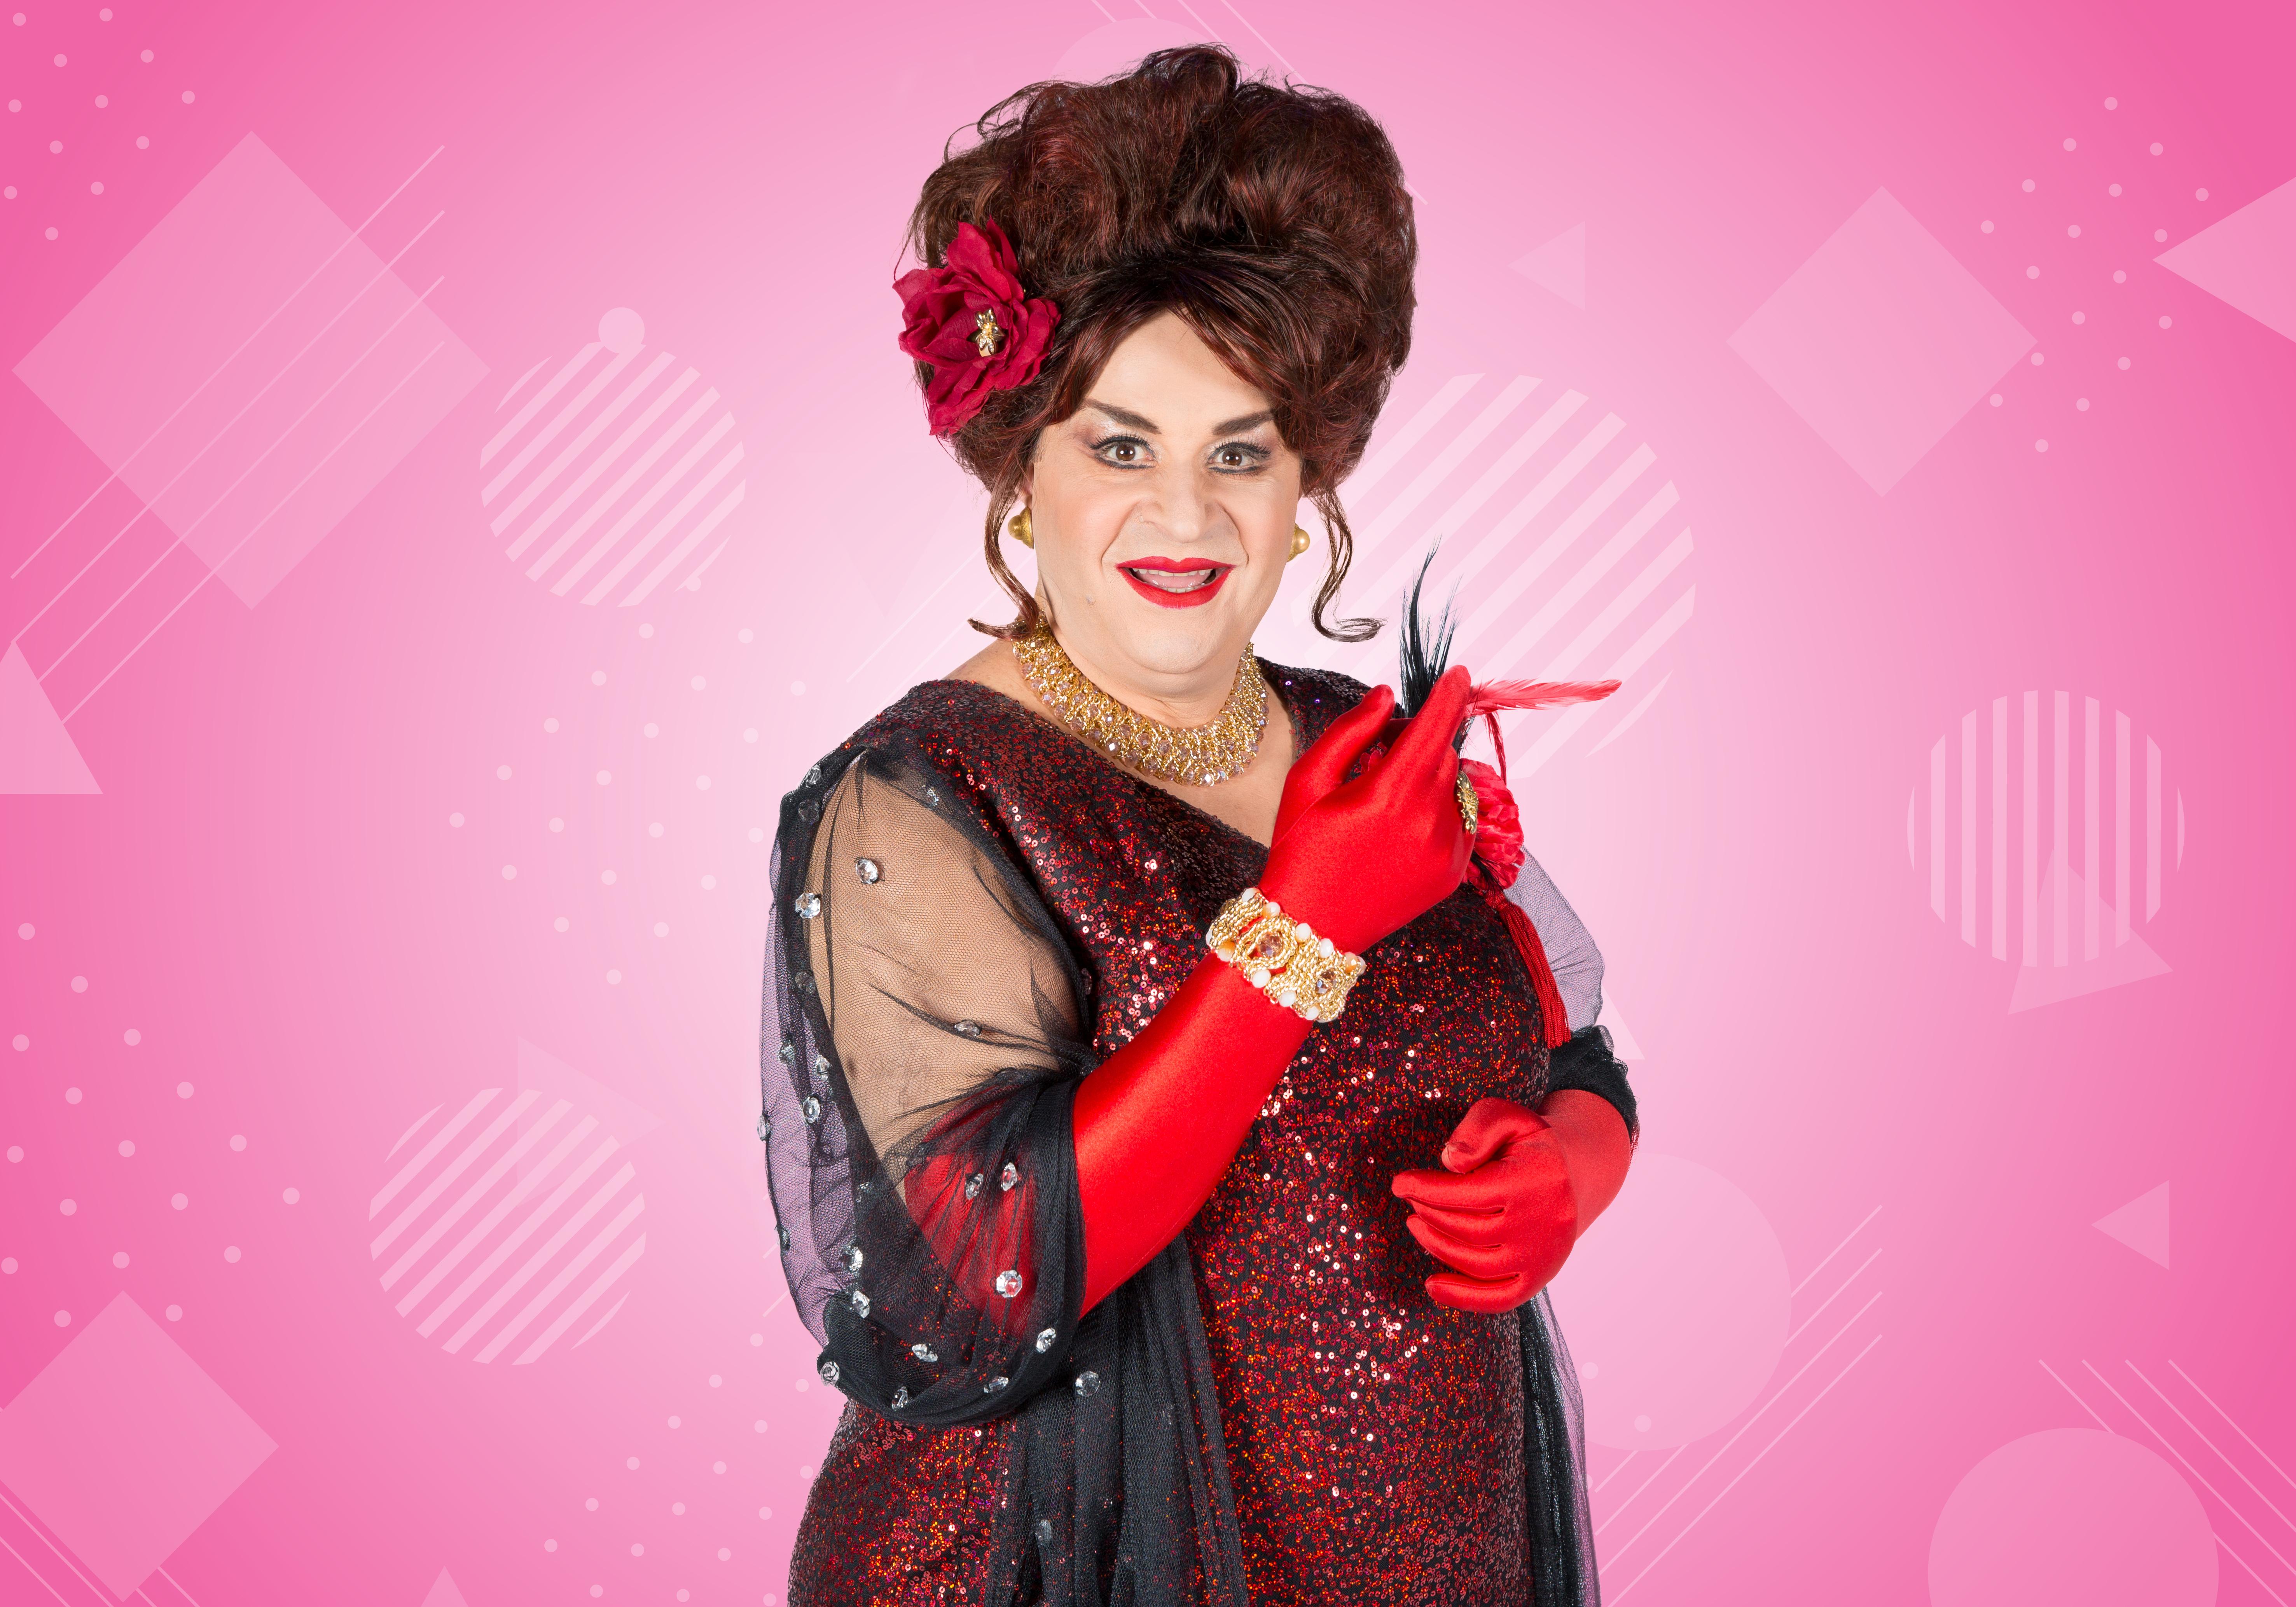 Hairspray Review: Είναι καλός ο Σεφερλής ως Edna;